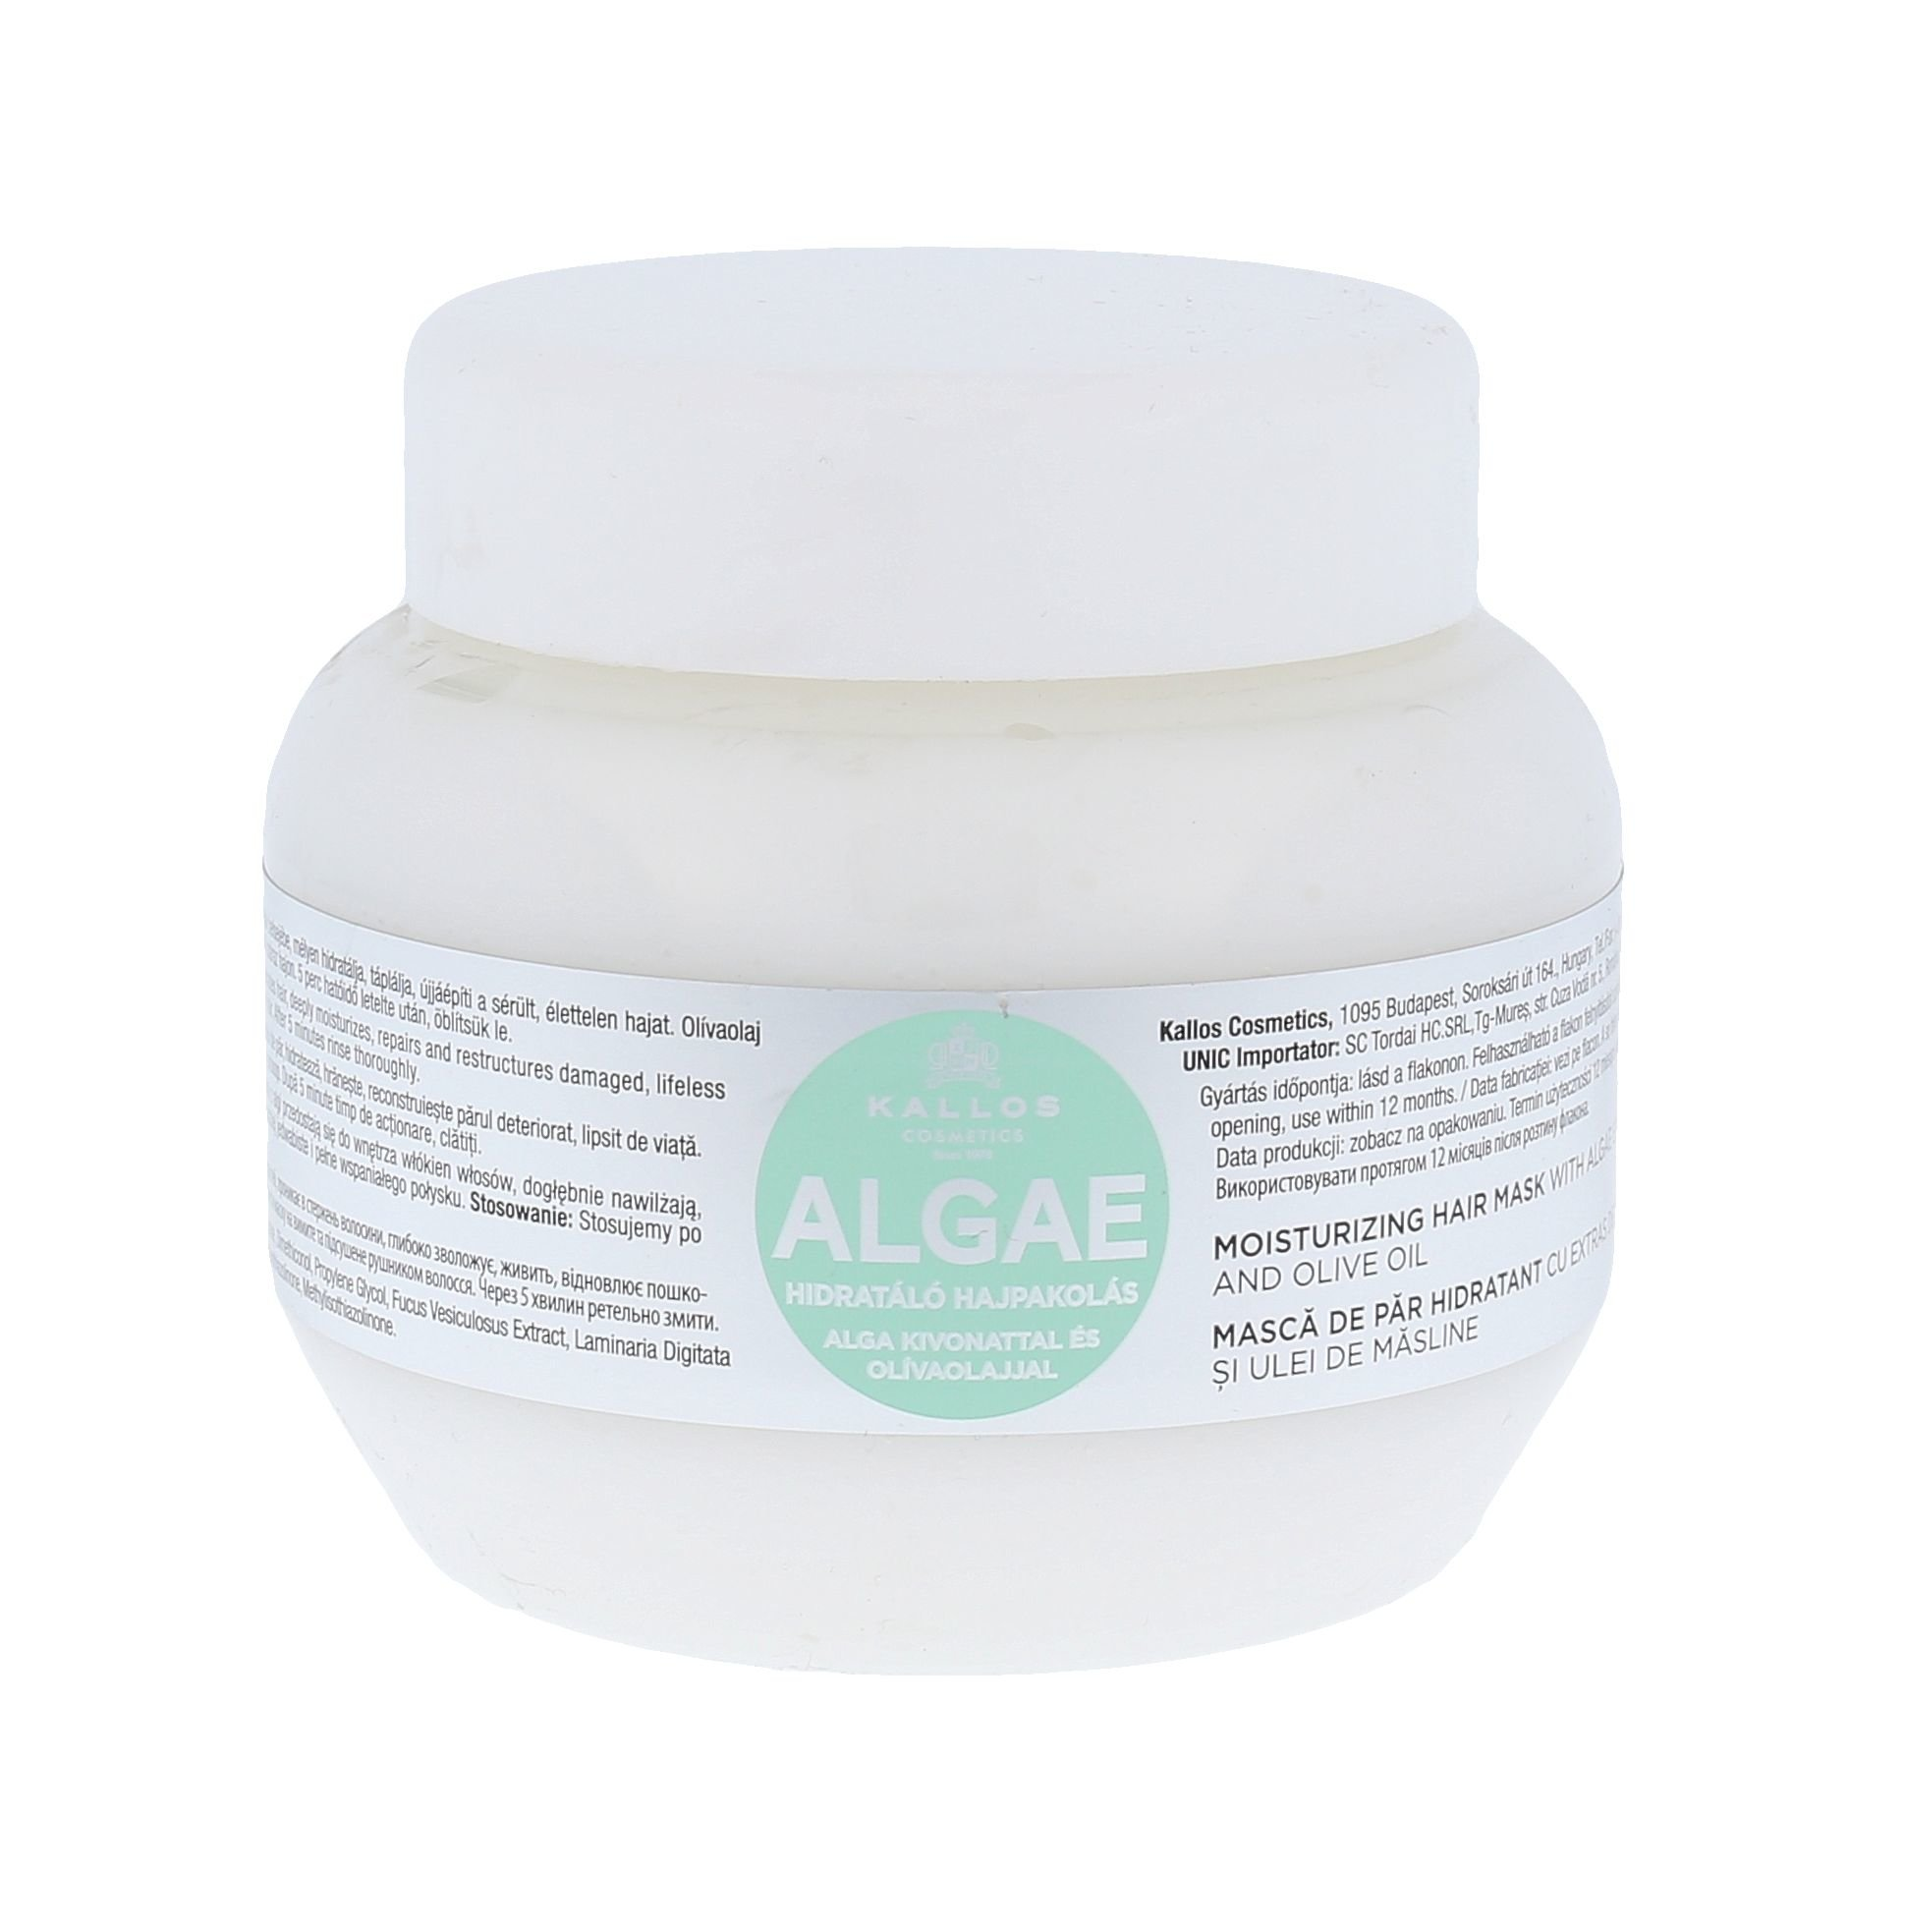 Kallos Algae Moisturizing Hair Mask Cosmetic 275ml